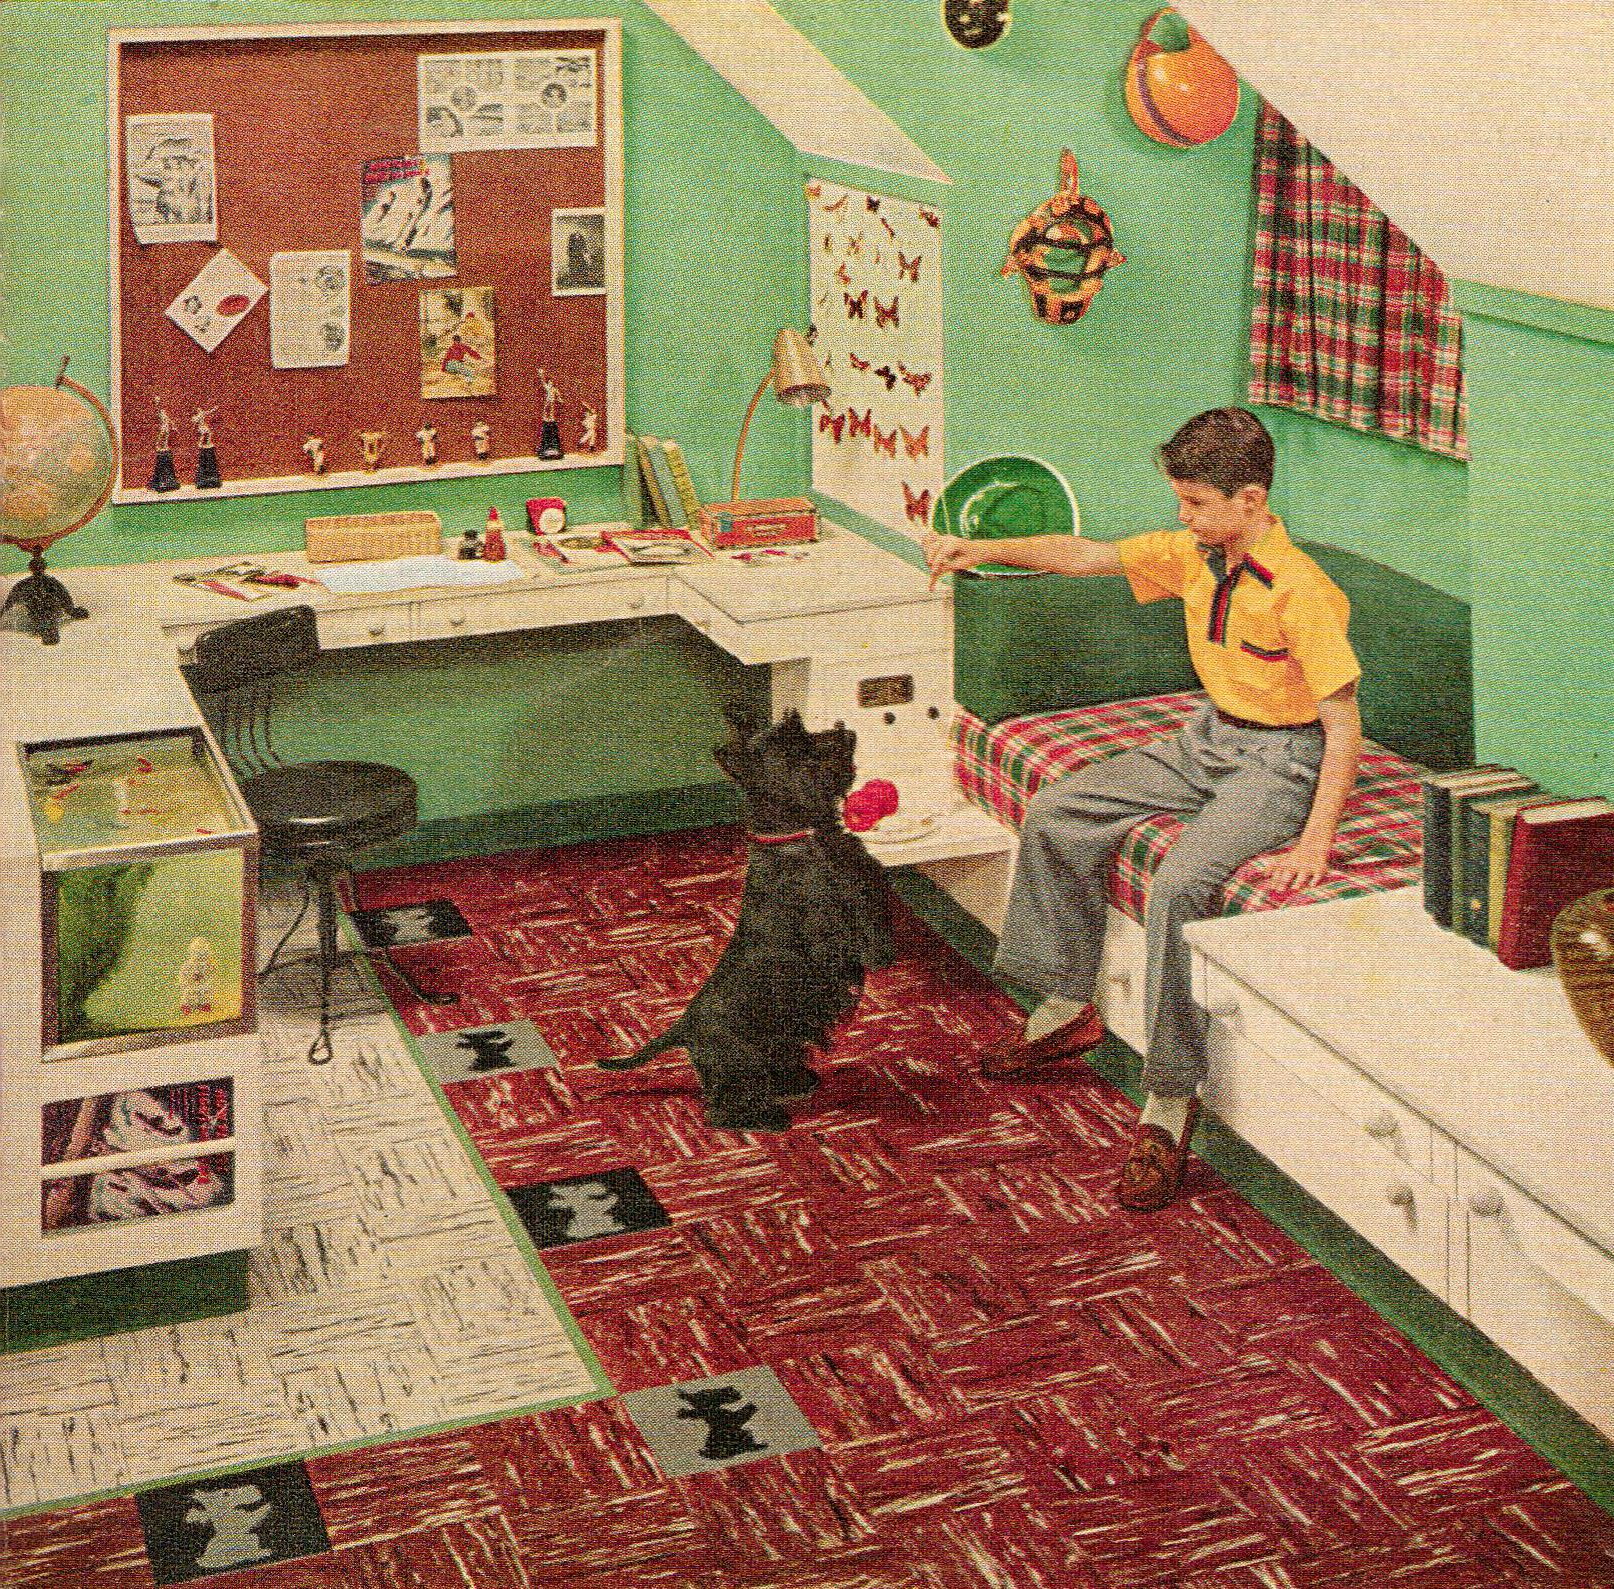 Custom Built Mid-century Bedroom For A Child, 1955 Http